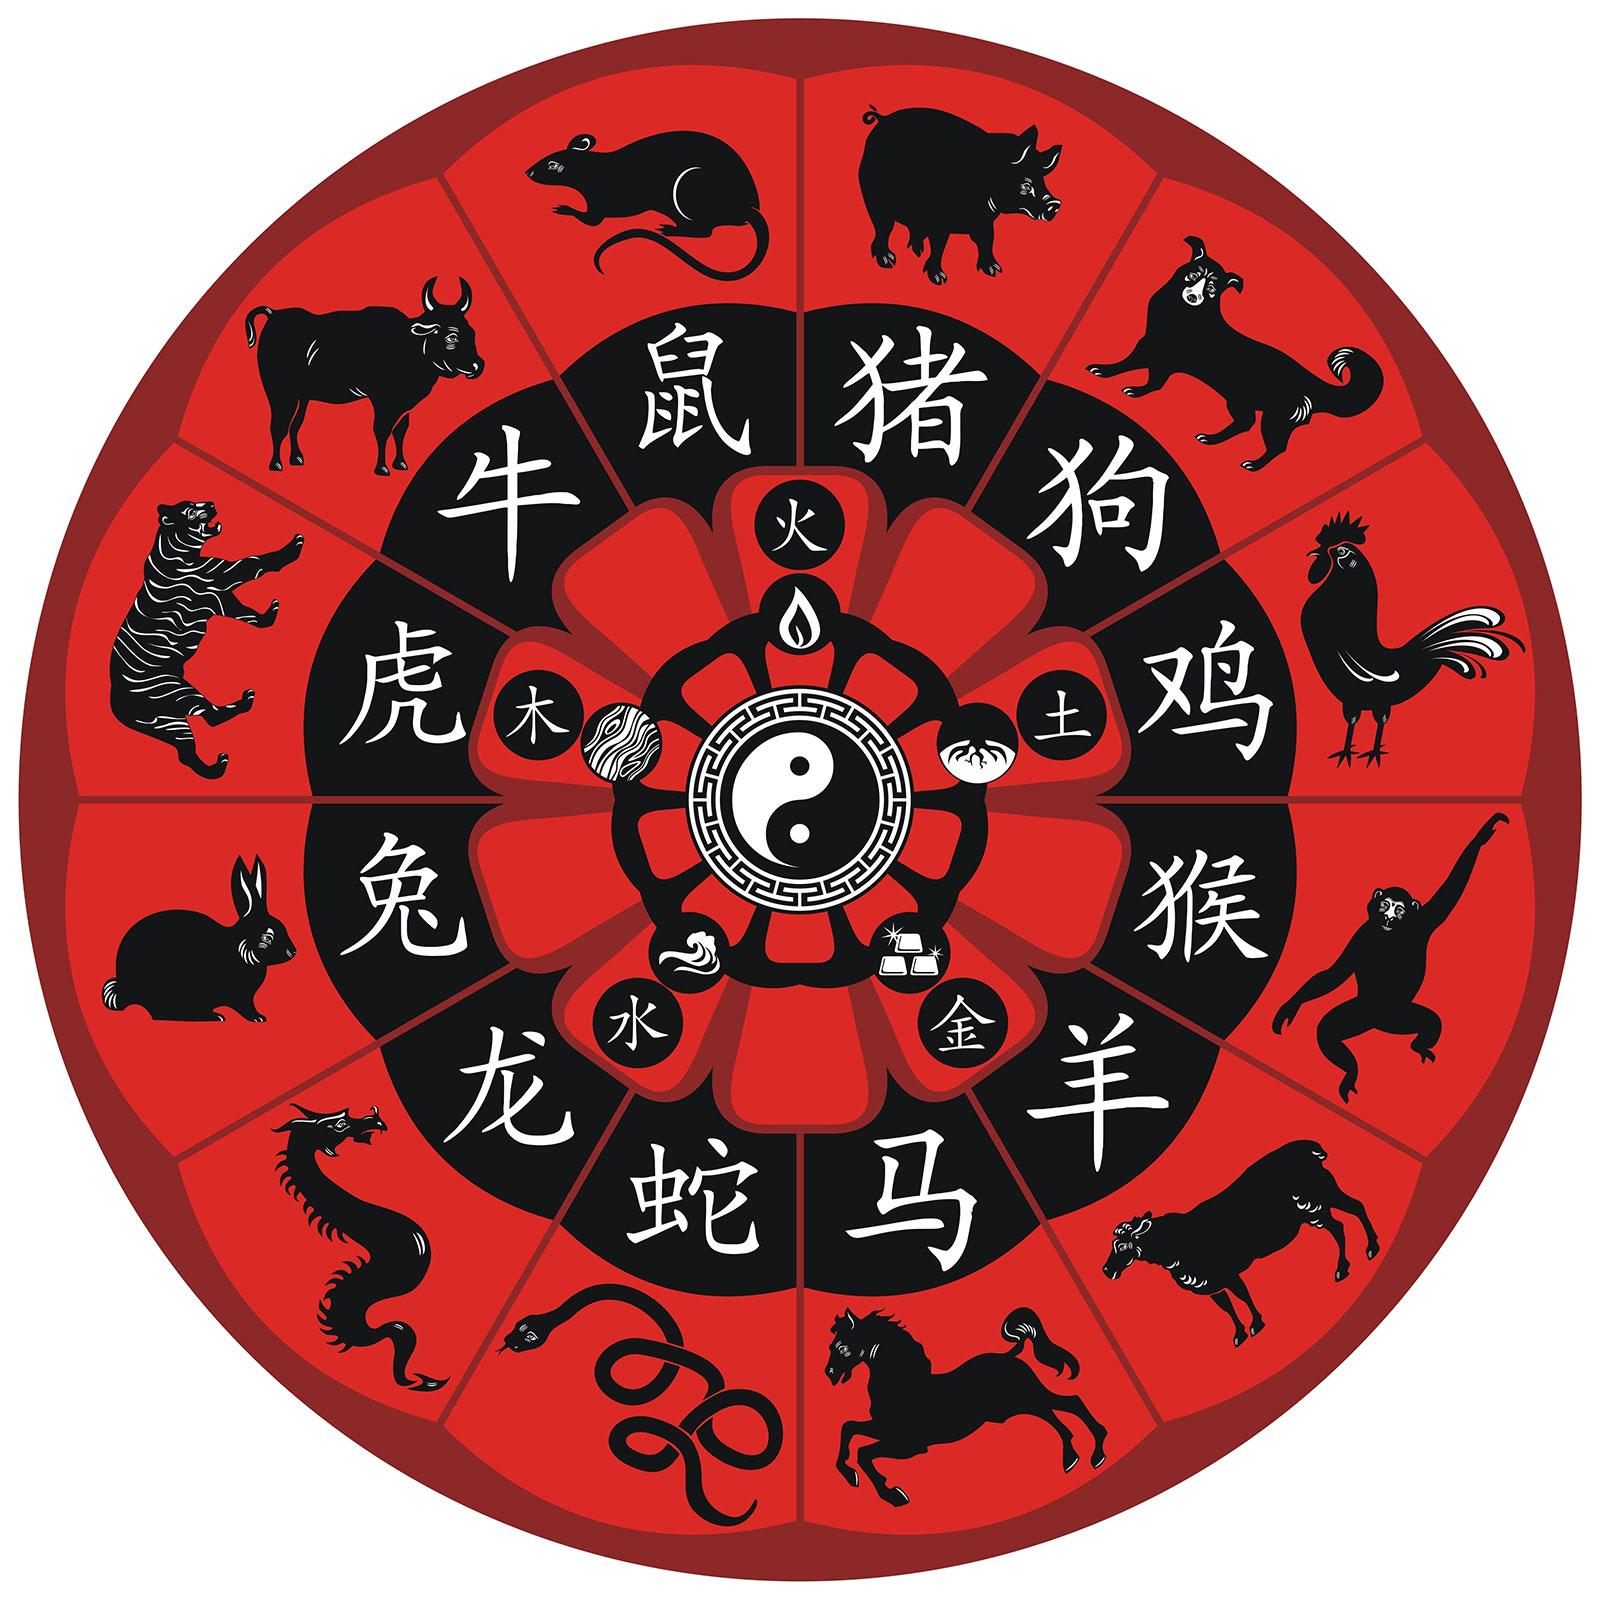 Astrología China - Man-Ho Kwok